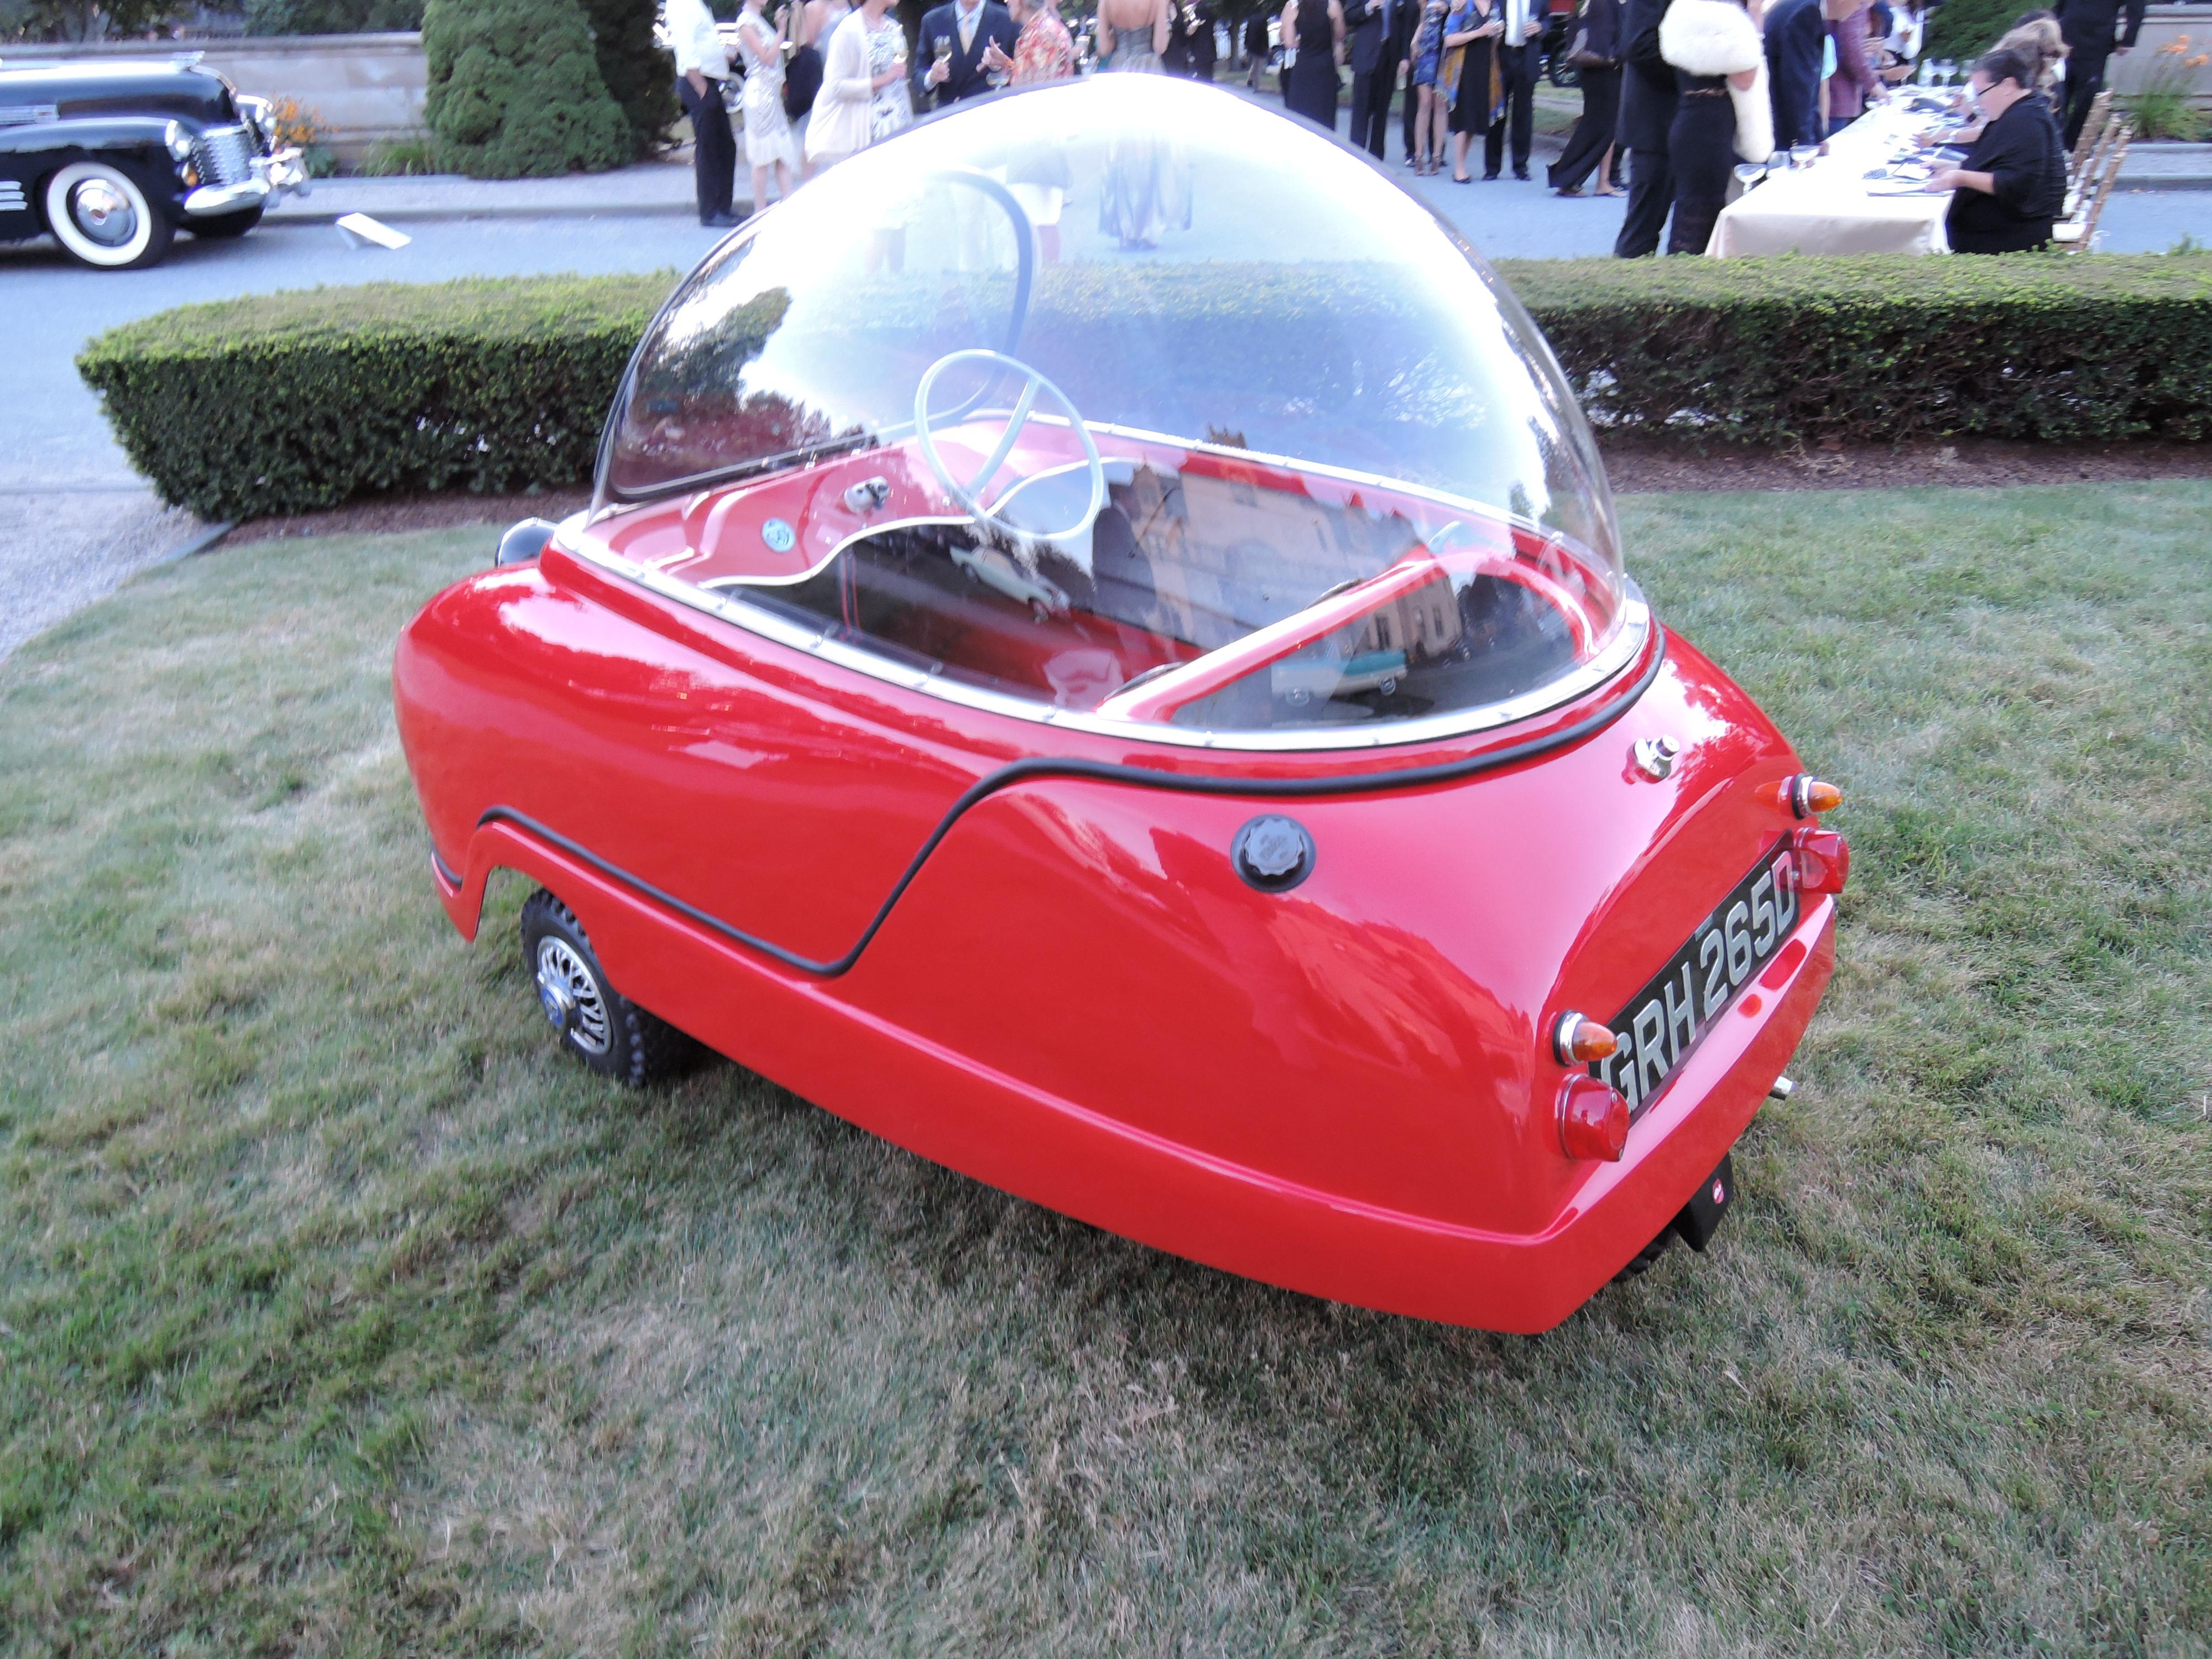 red 1965 Peel Trident - Audrain Auto Museum Gala 2017